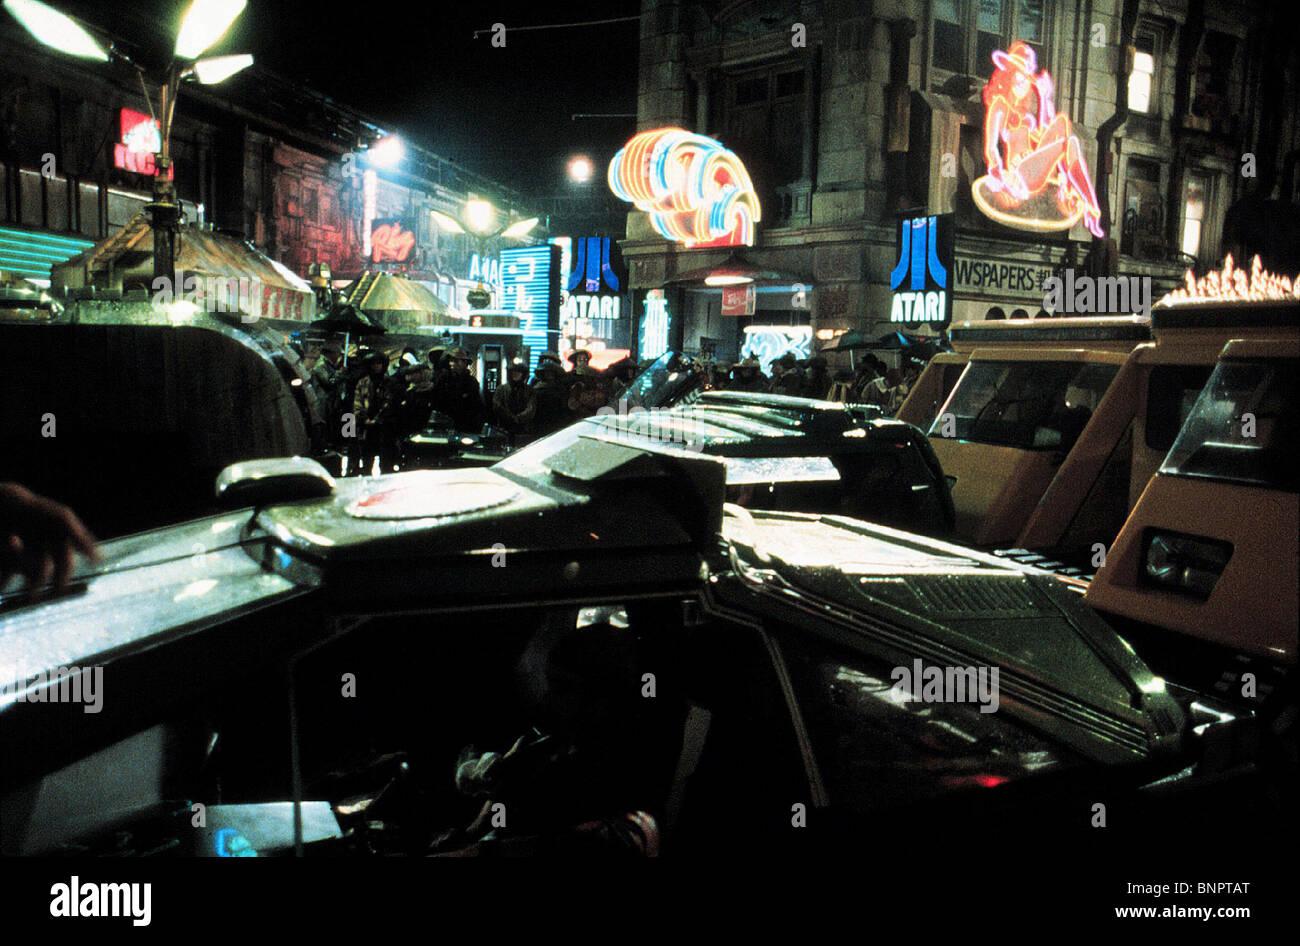 FUTURISTIC STREET SCENE BLADE RUNNER (1982) - Stock Image